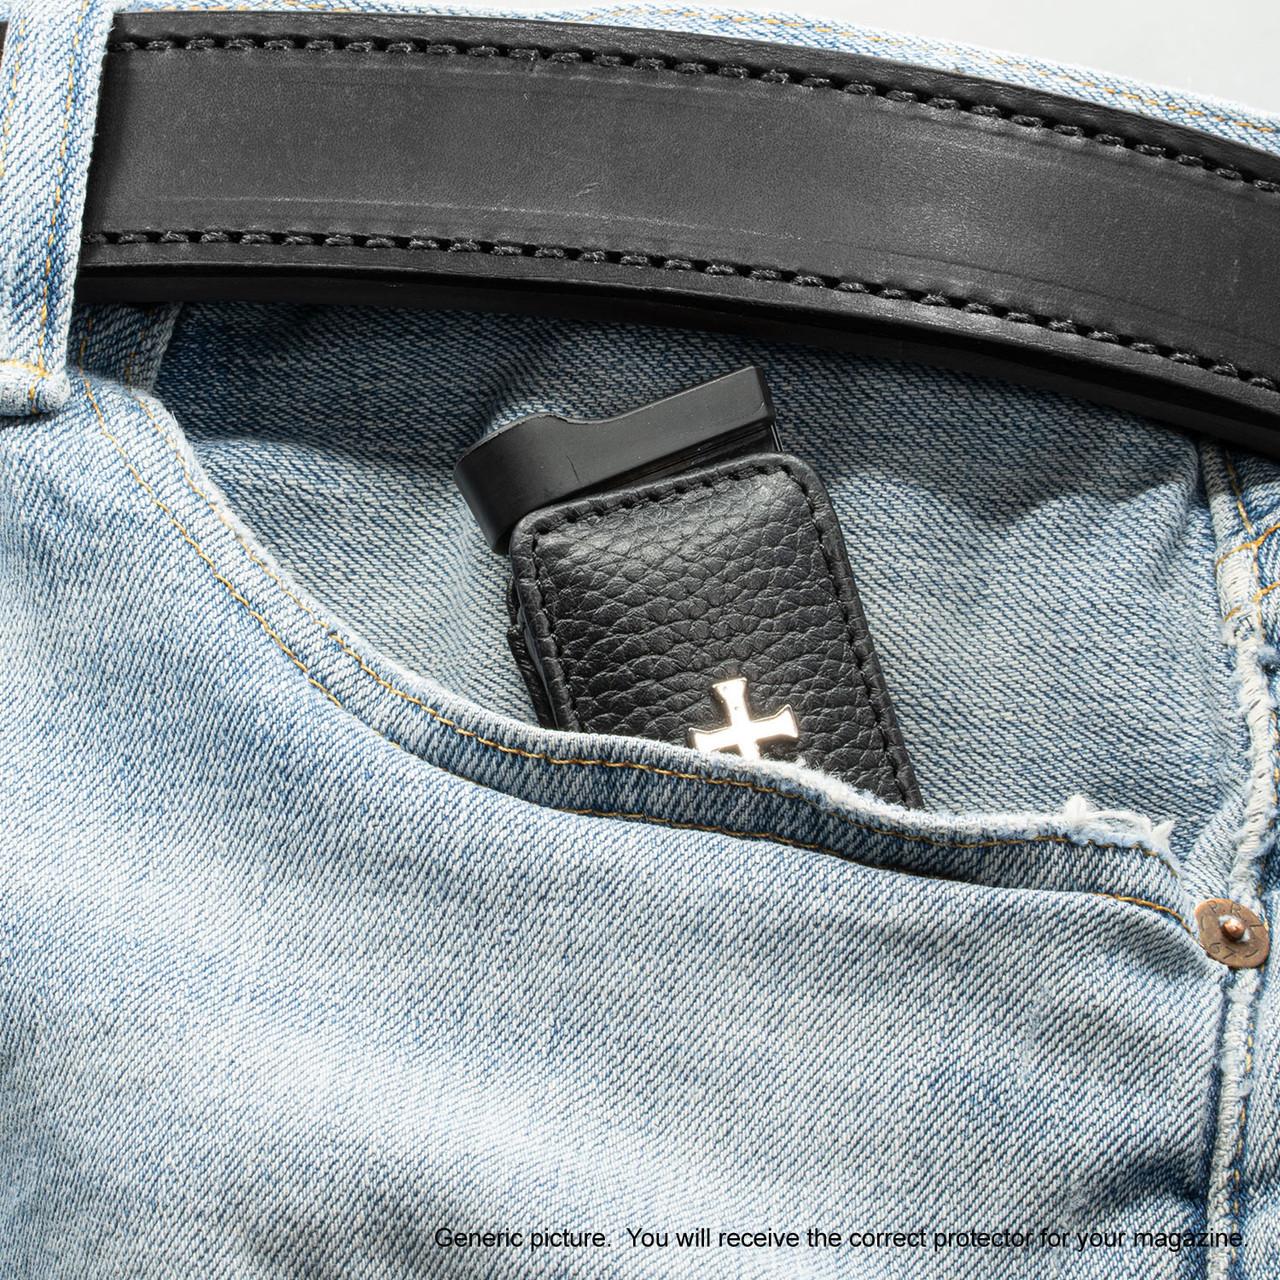 Remington R51 Black Cross Magazine Pocket Protector